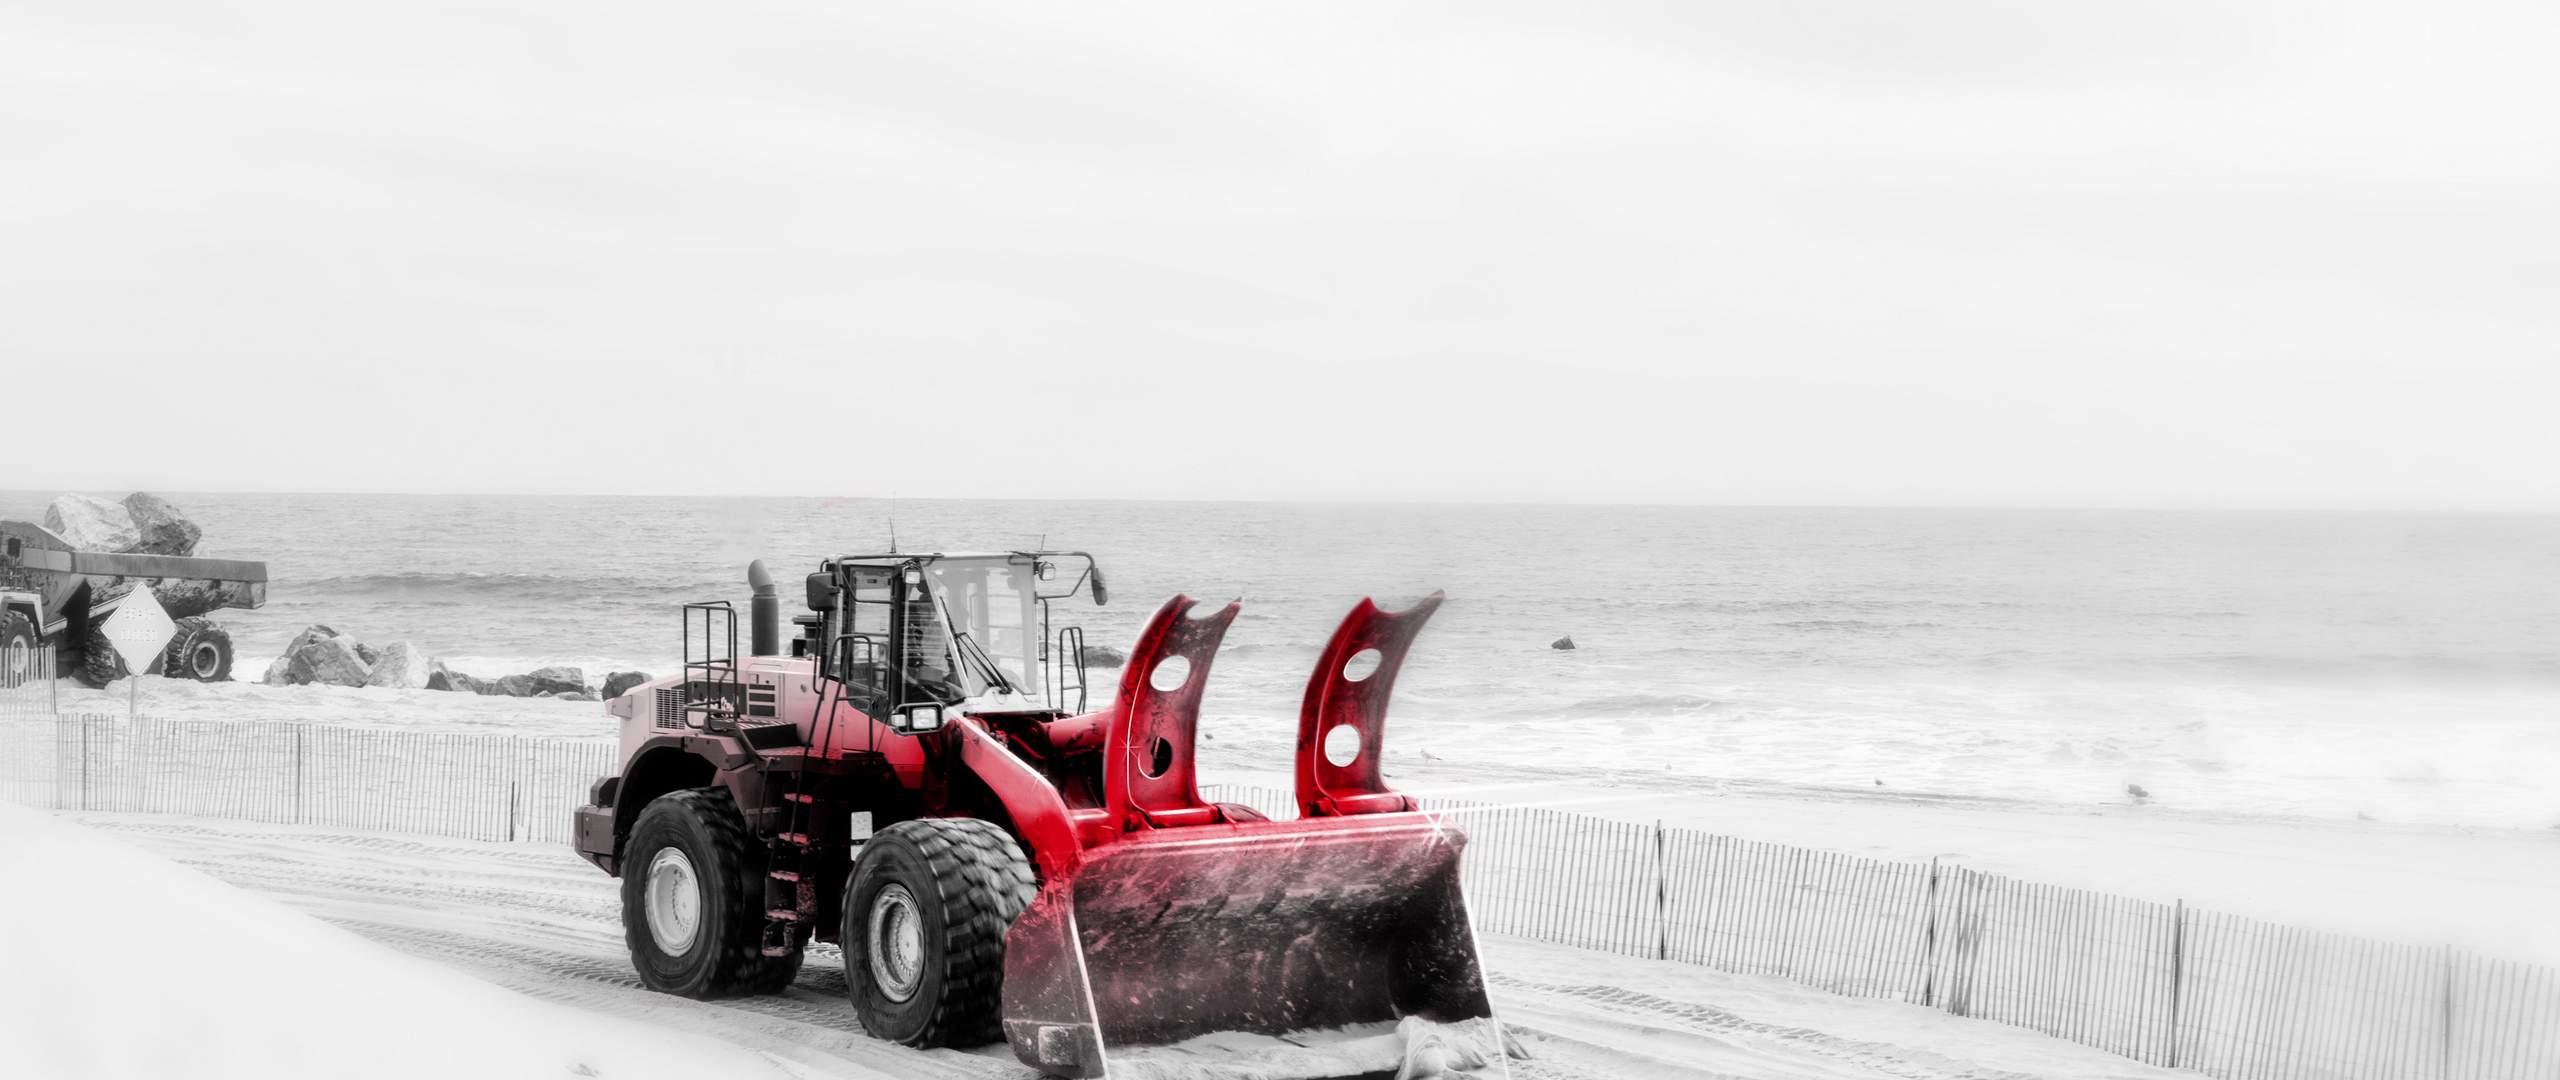 Solutions for industrial machinery & heavy equipment | Janus Engineering